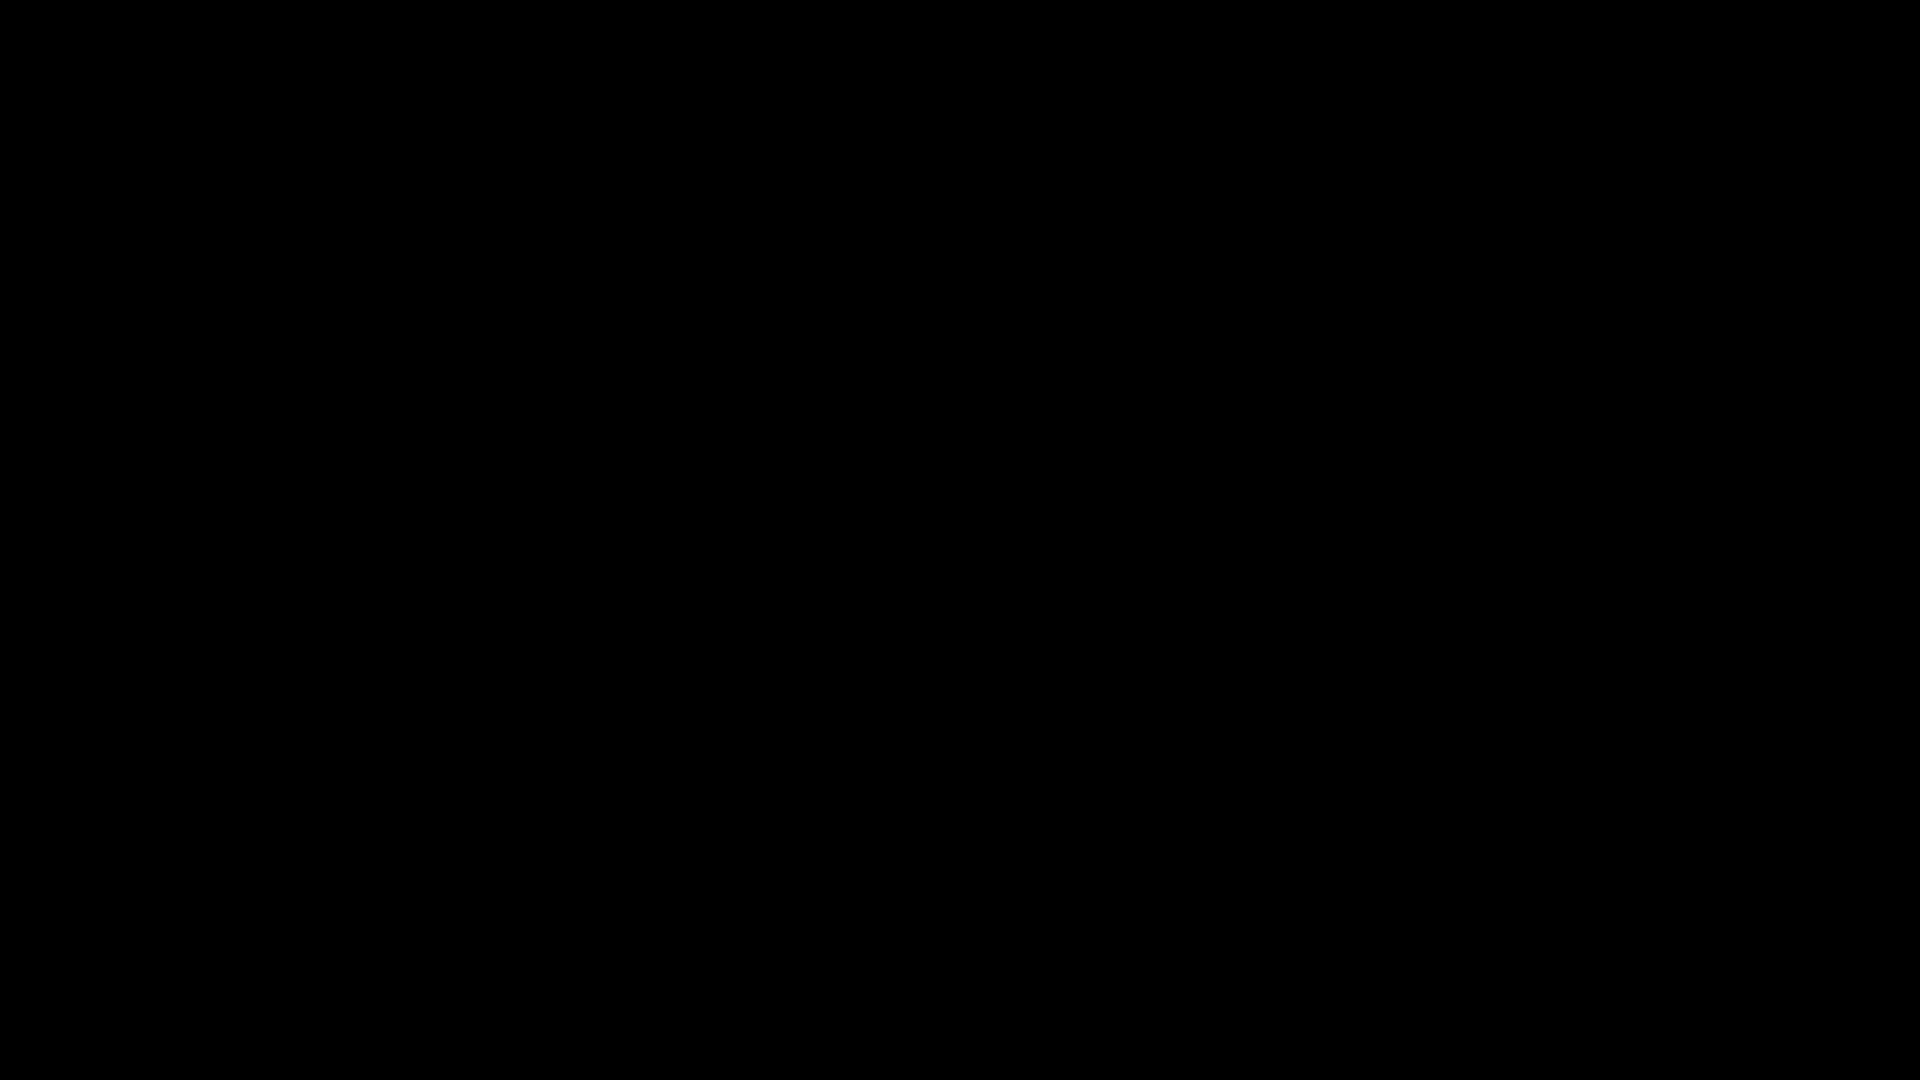 sfondonero